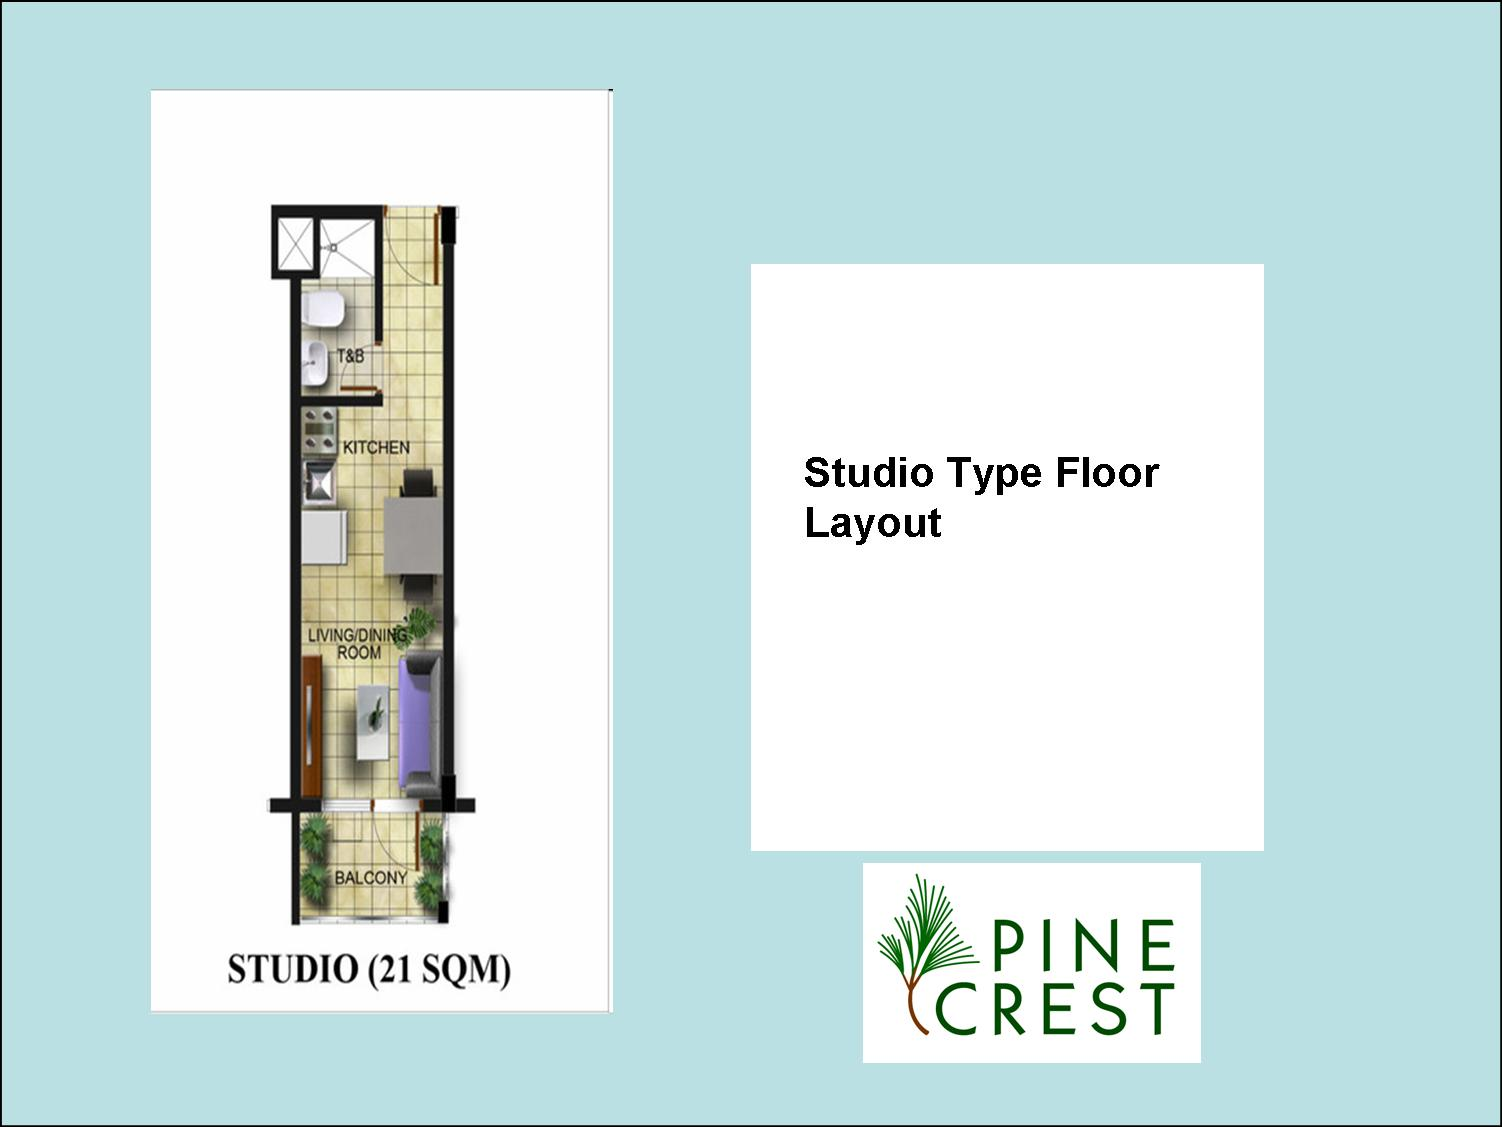 Pine Crest Vistaland International Marketing Inc